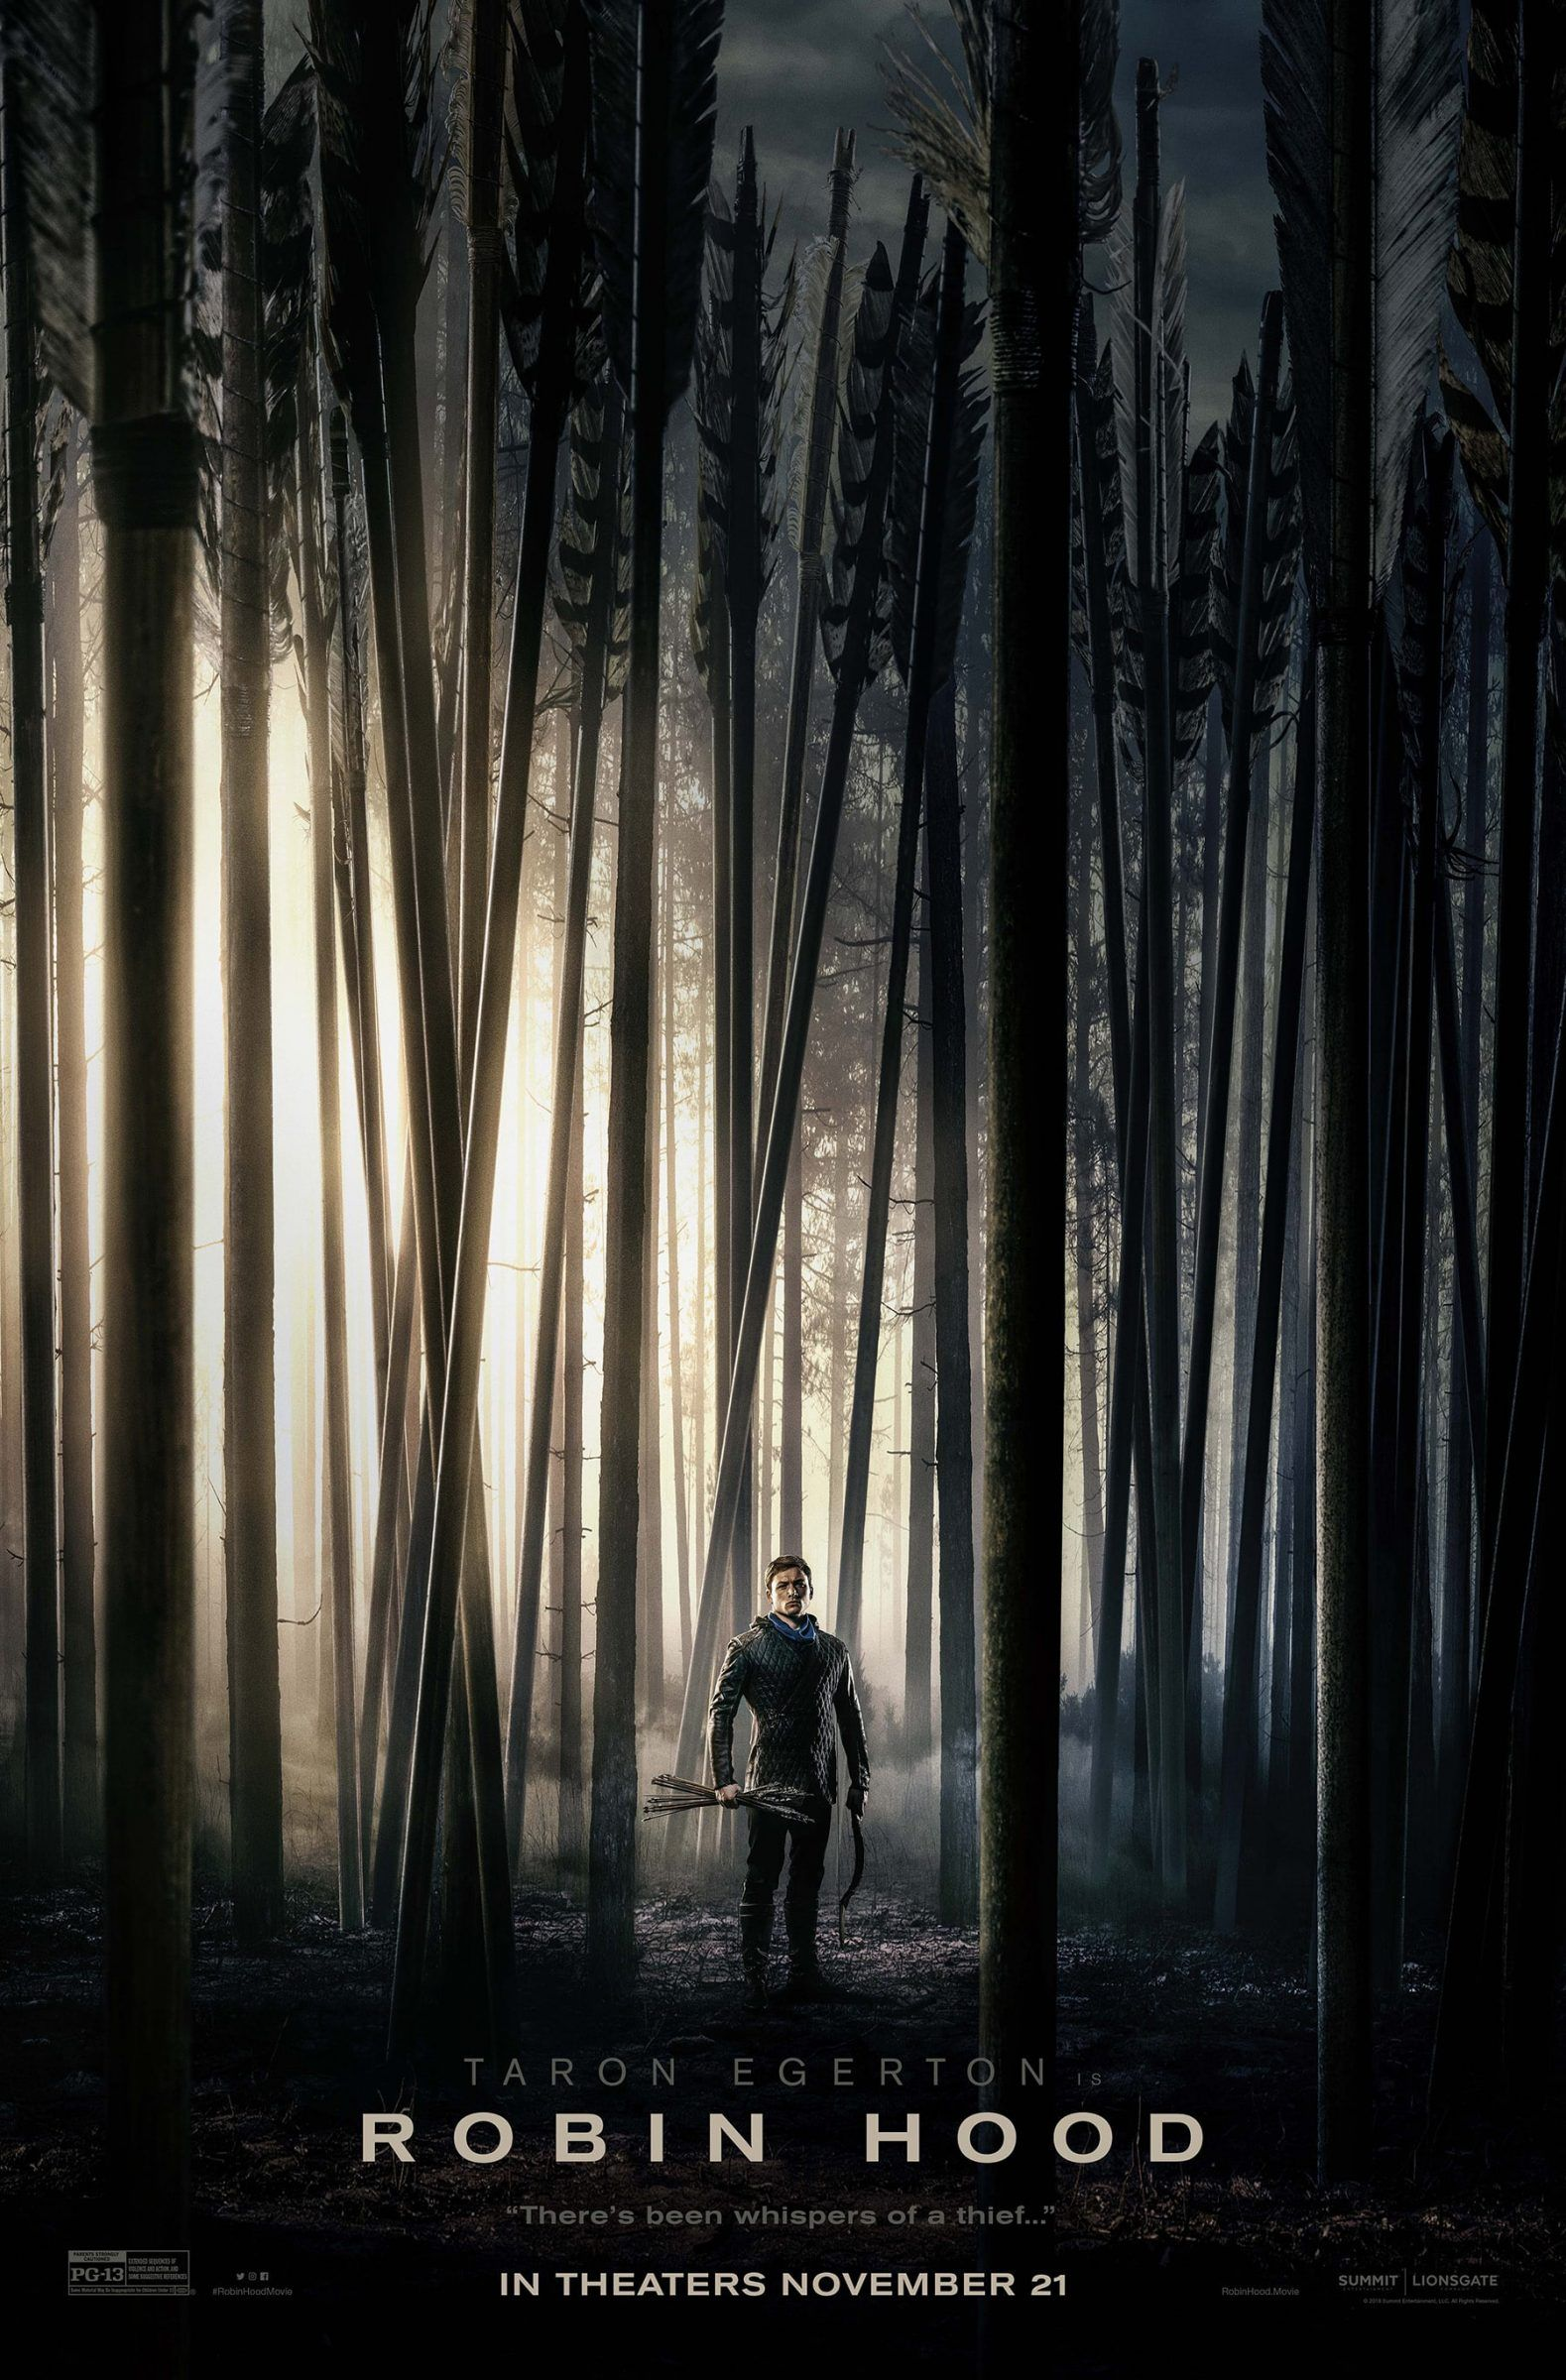 Robin Hood HD Wallpapers 7wallpapersnet Movies in 2019 Full 1579x2400